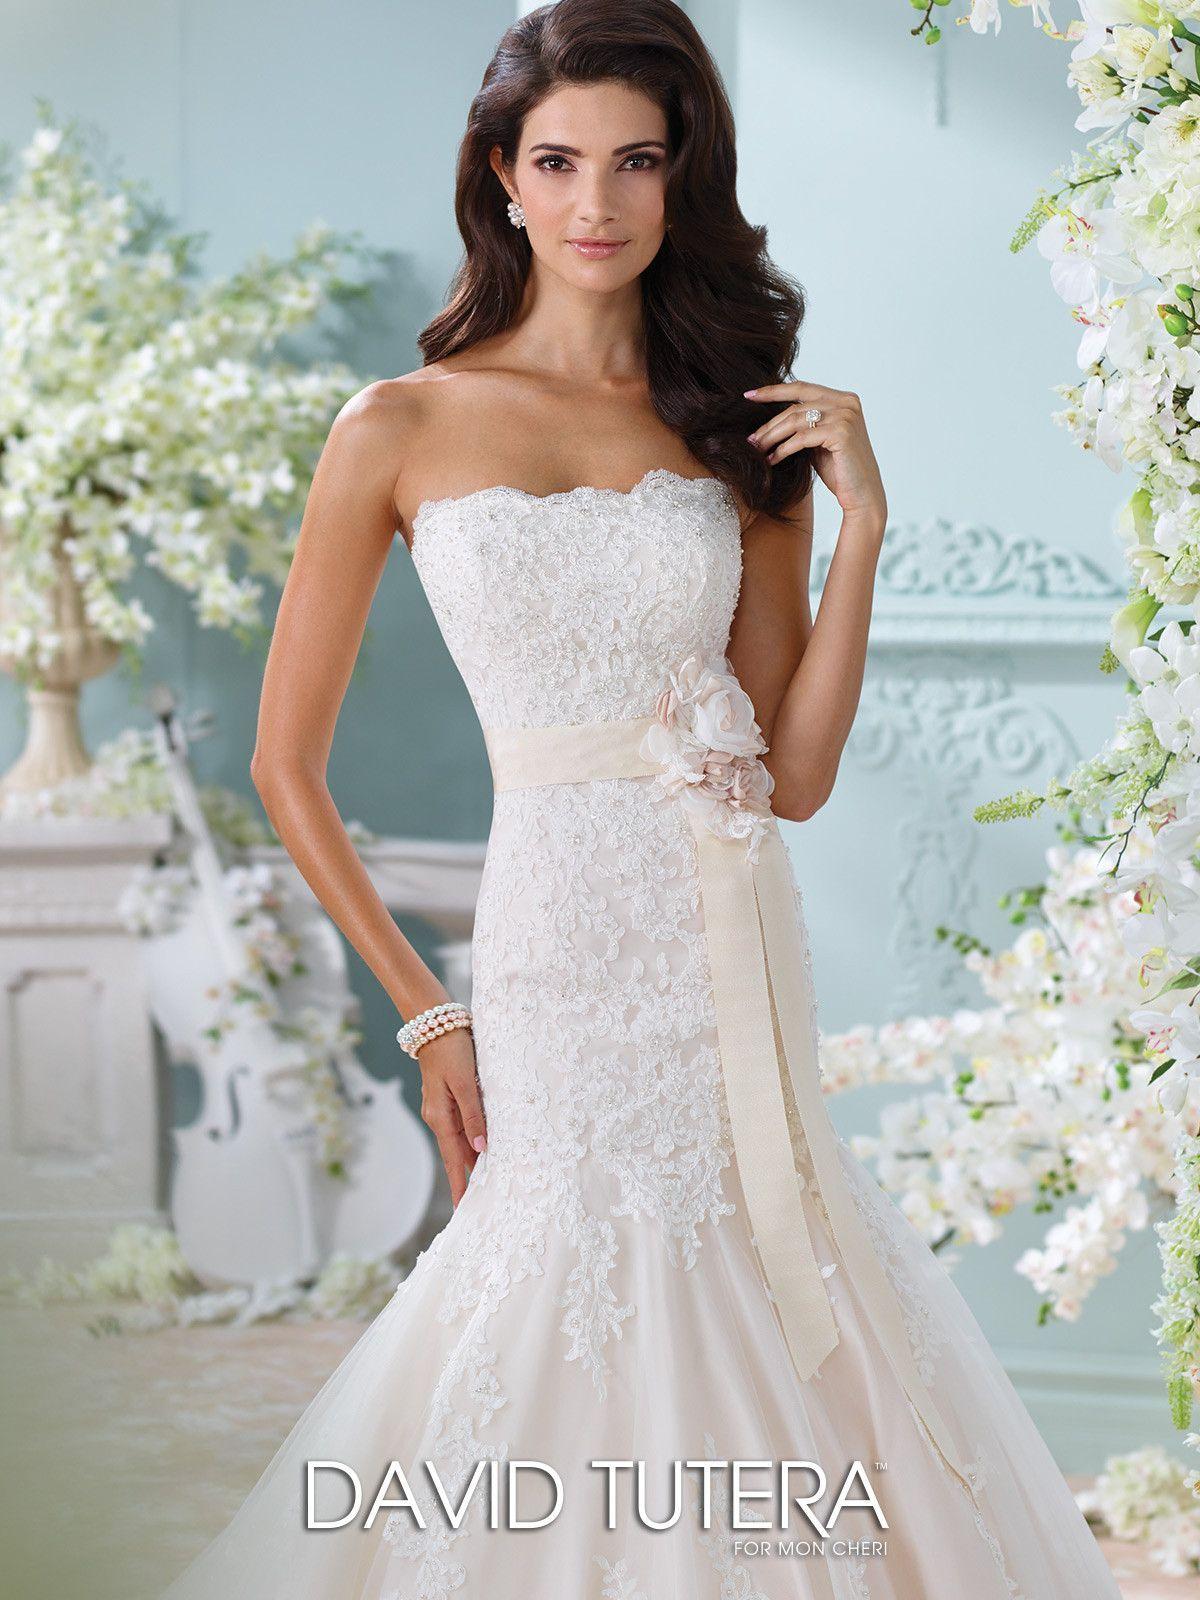 69ec650006ee6 Last Dress In Stock; Size: 12, Color: Ivory/Petal - Martin Thornburg ...